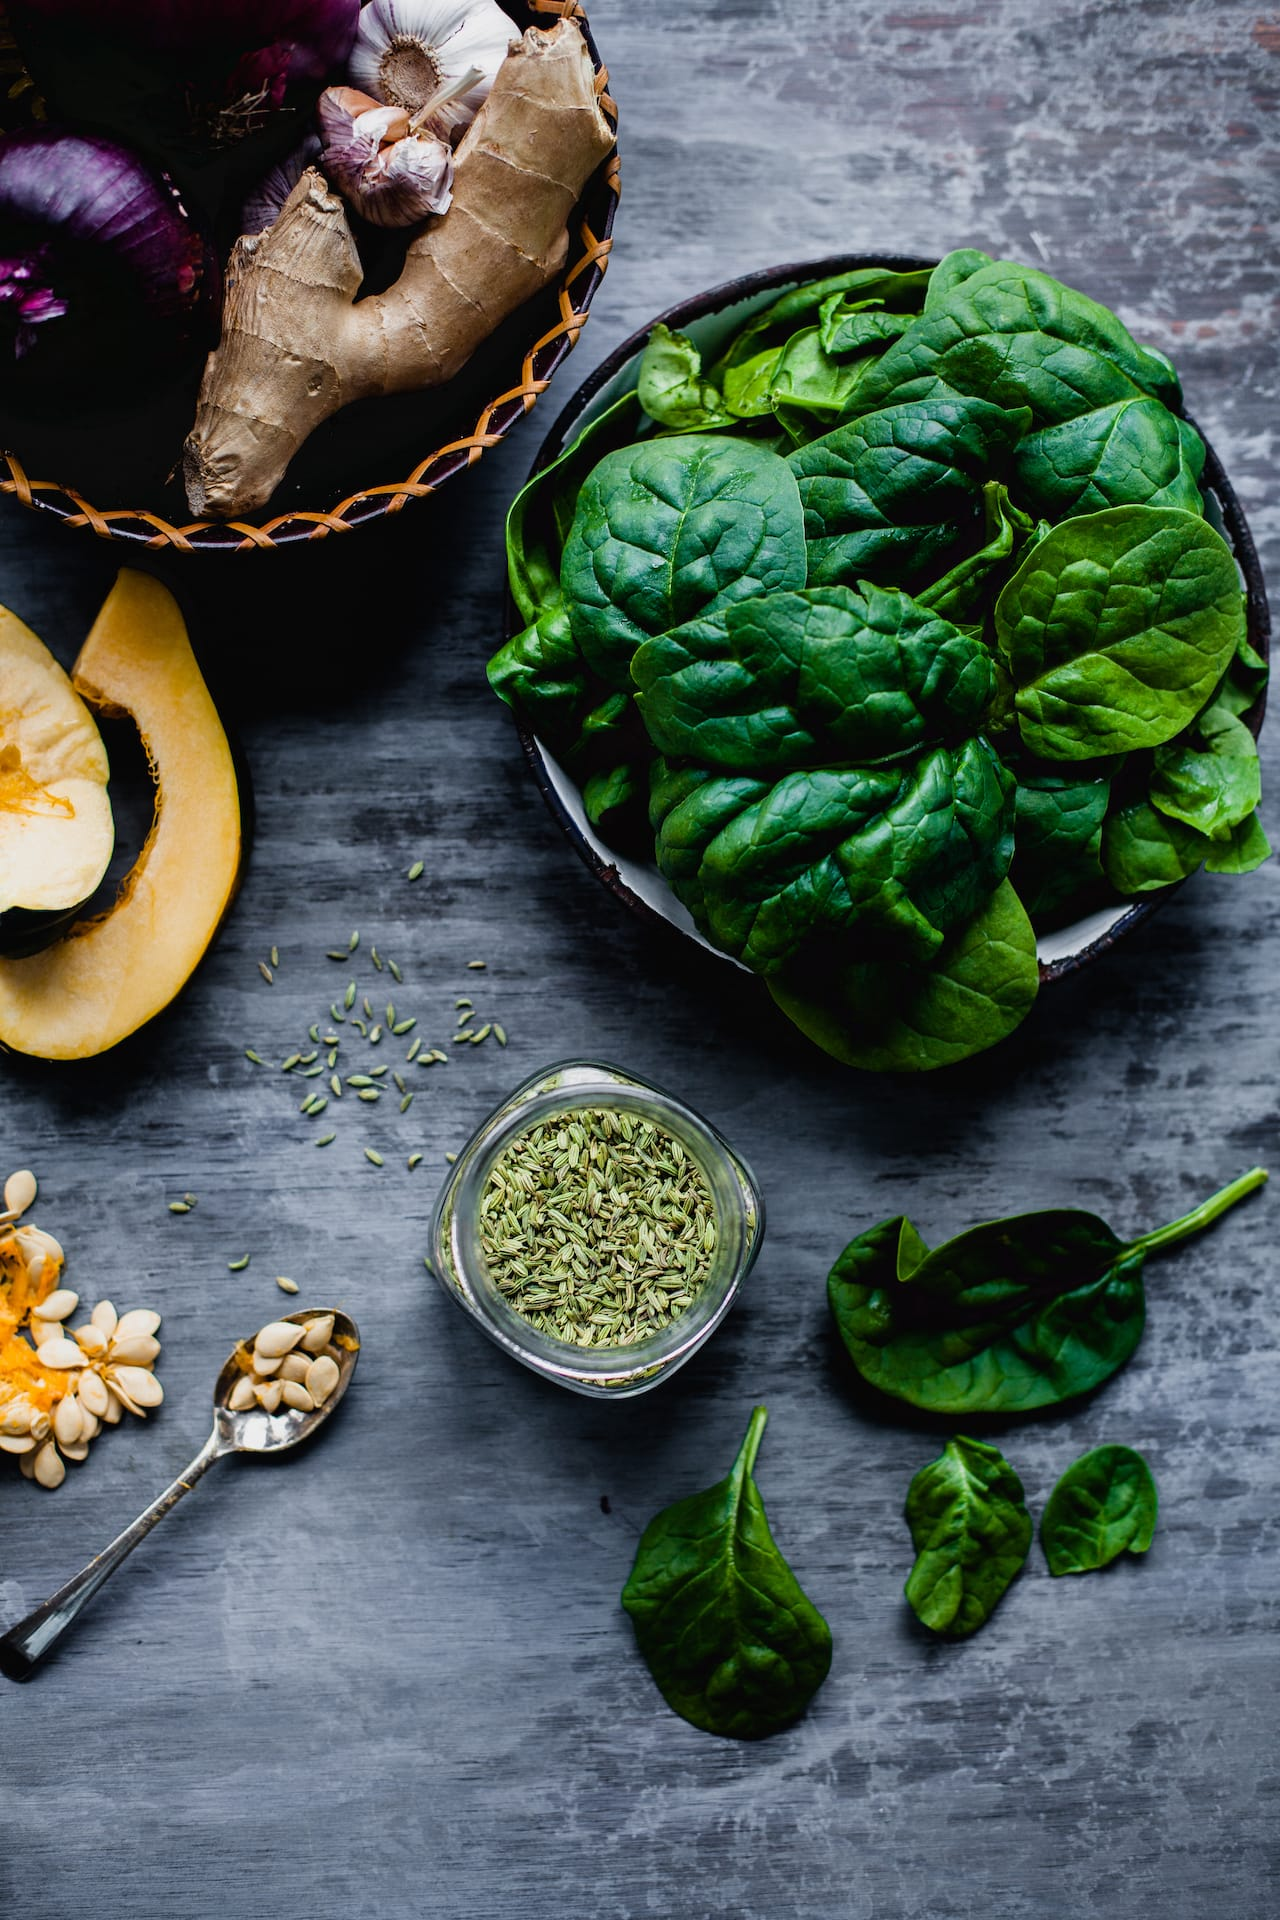 Kumro Palak (Acorn Squash And Spinach Stir Fry) | Playful Cooking #bengali #squash #spinach #indian #foodphotography